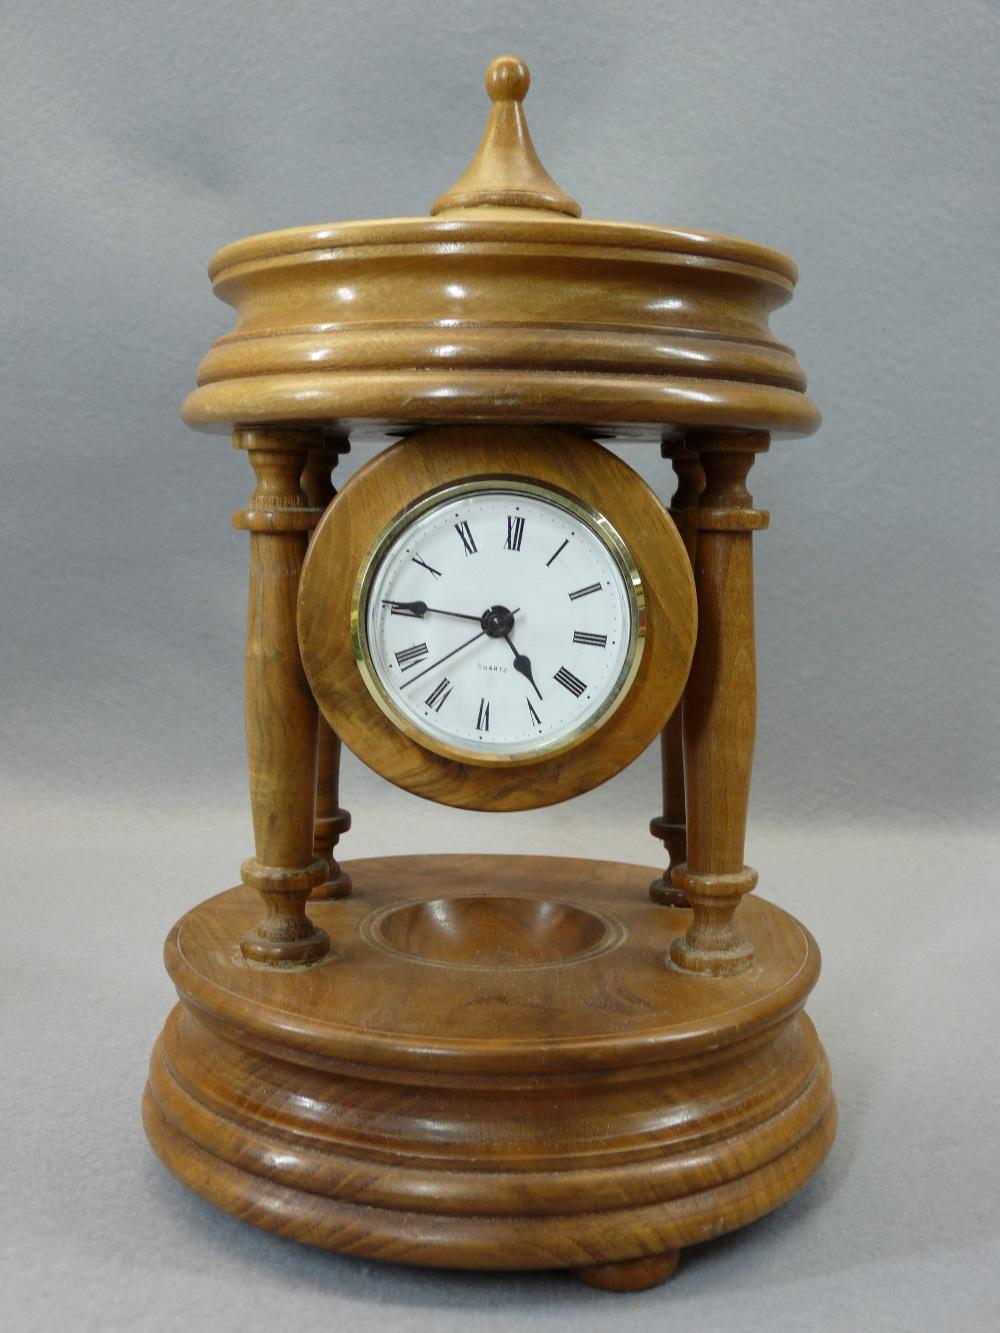 TURNED WALNUT DRUM CASED QUARTZ MANTEL CLOCK and a Victorian cheapware pottery mantel clock, 29 - Image 3 of 3